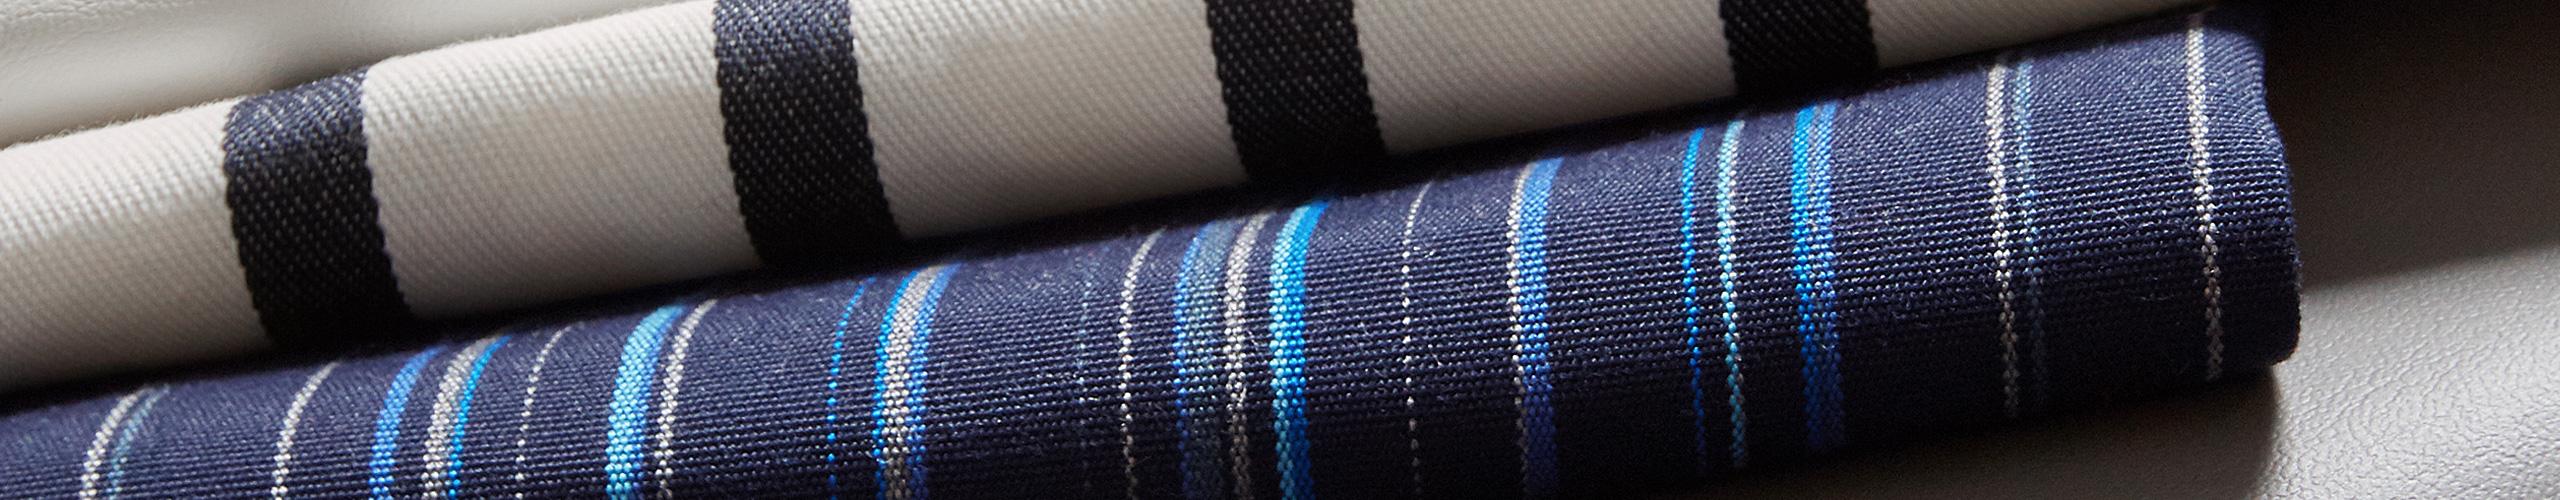 Pavilion Fabrics